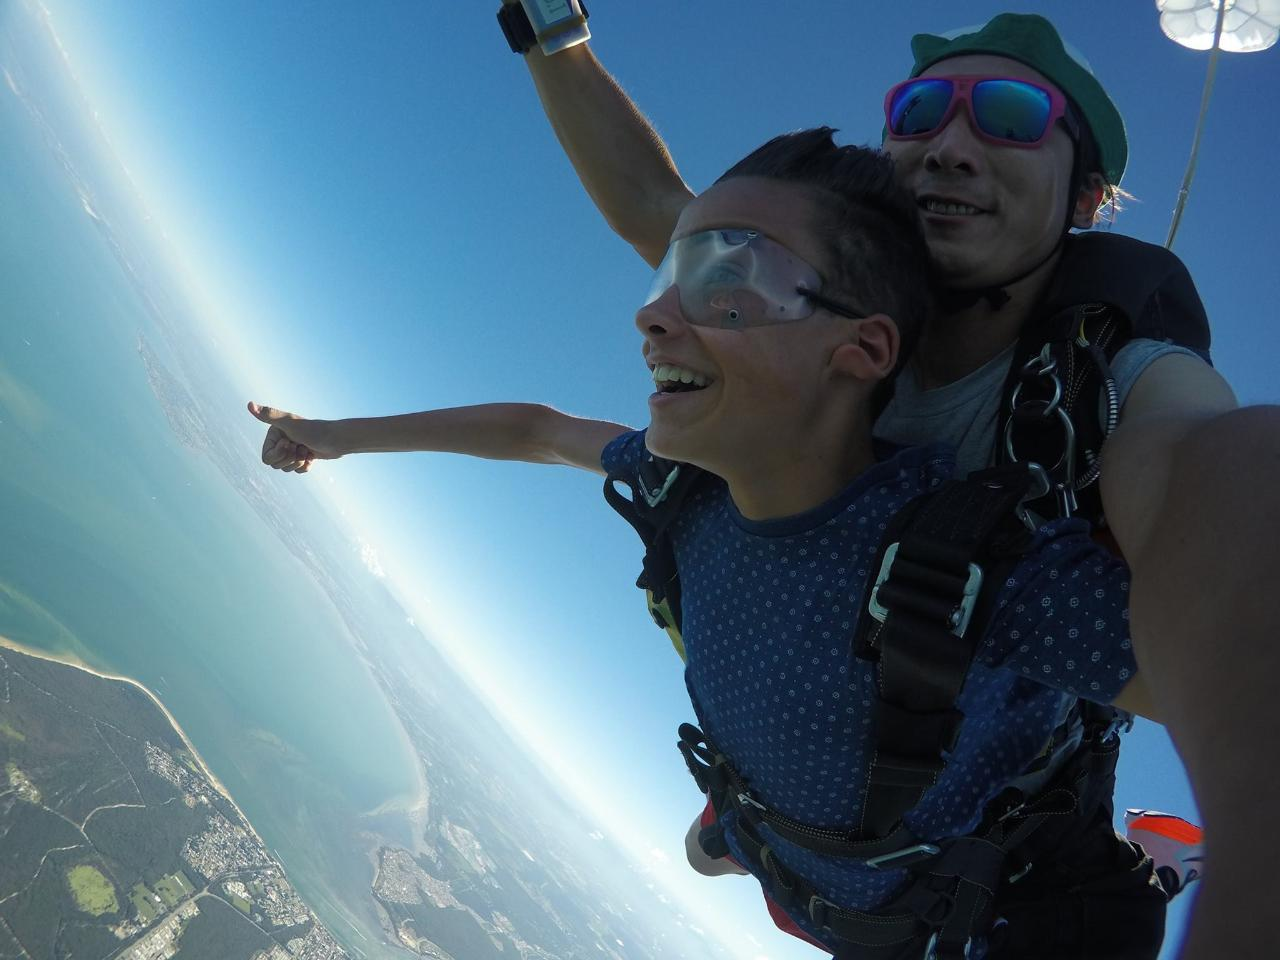 Skydive Castaway 4 Day/3 Night